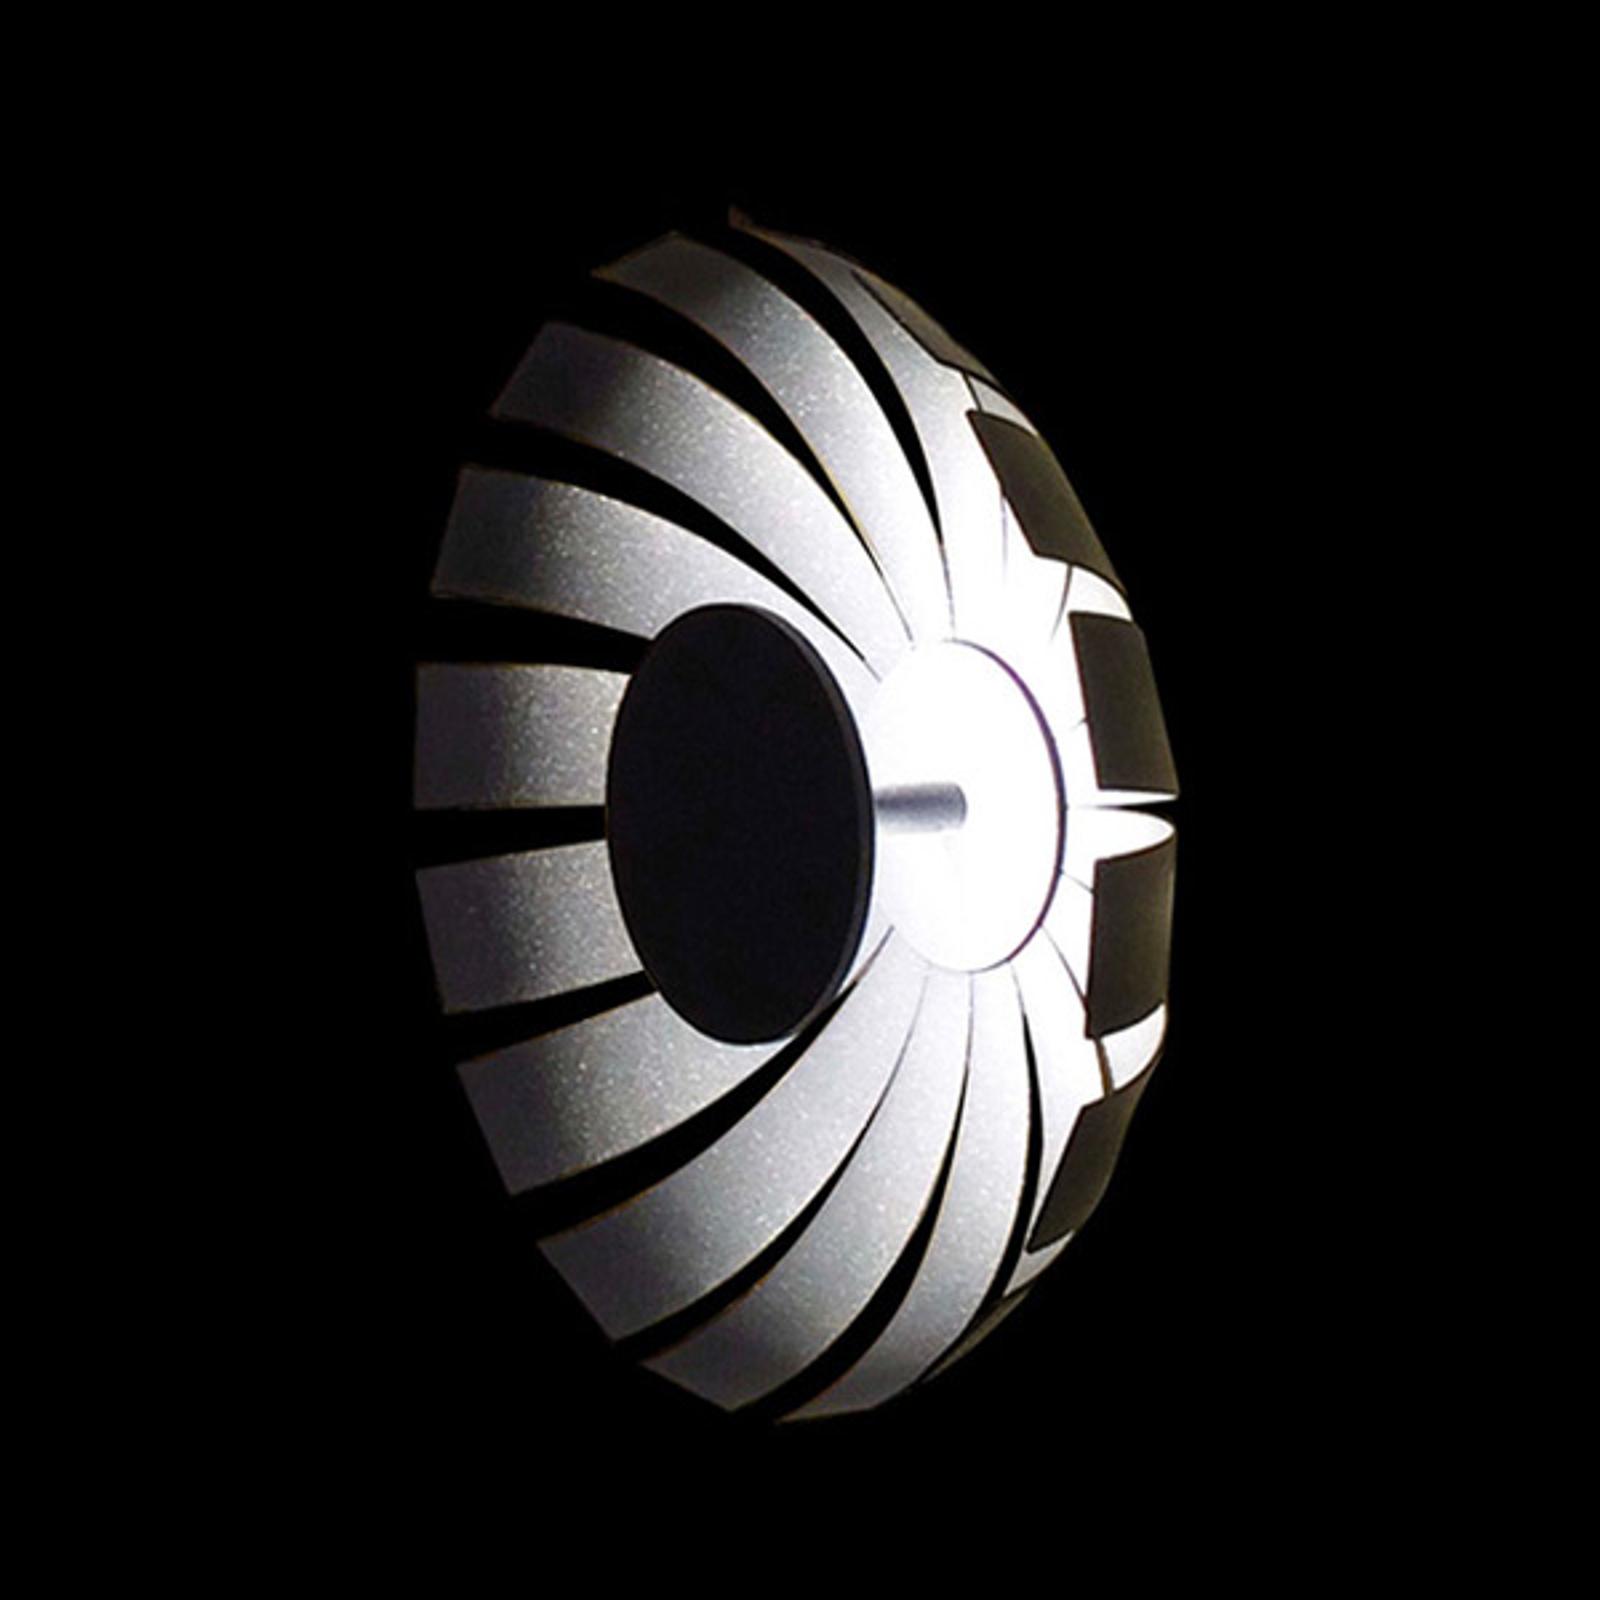 LED design plafondlamp Loto, antraciet, 27 cm